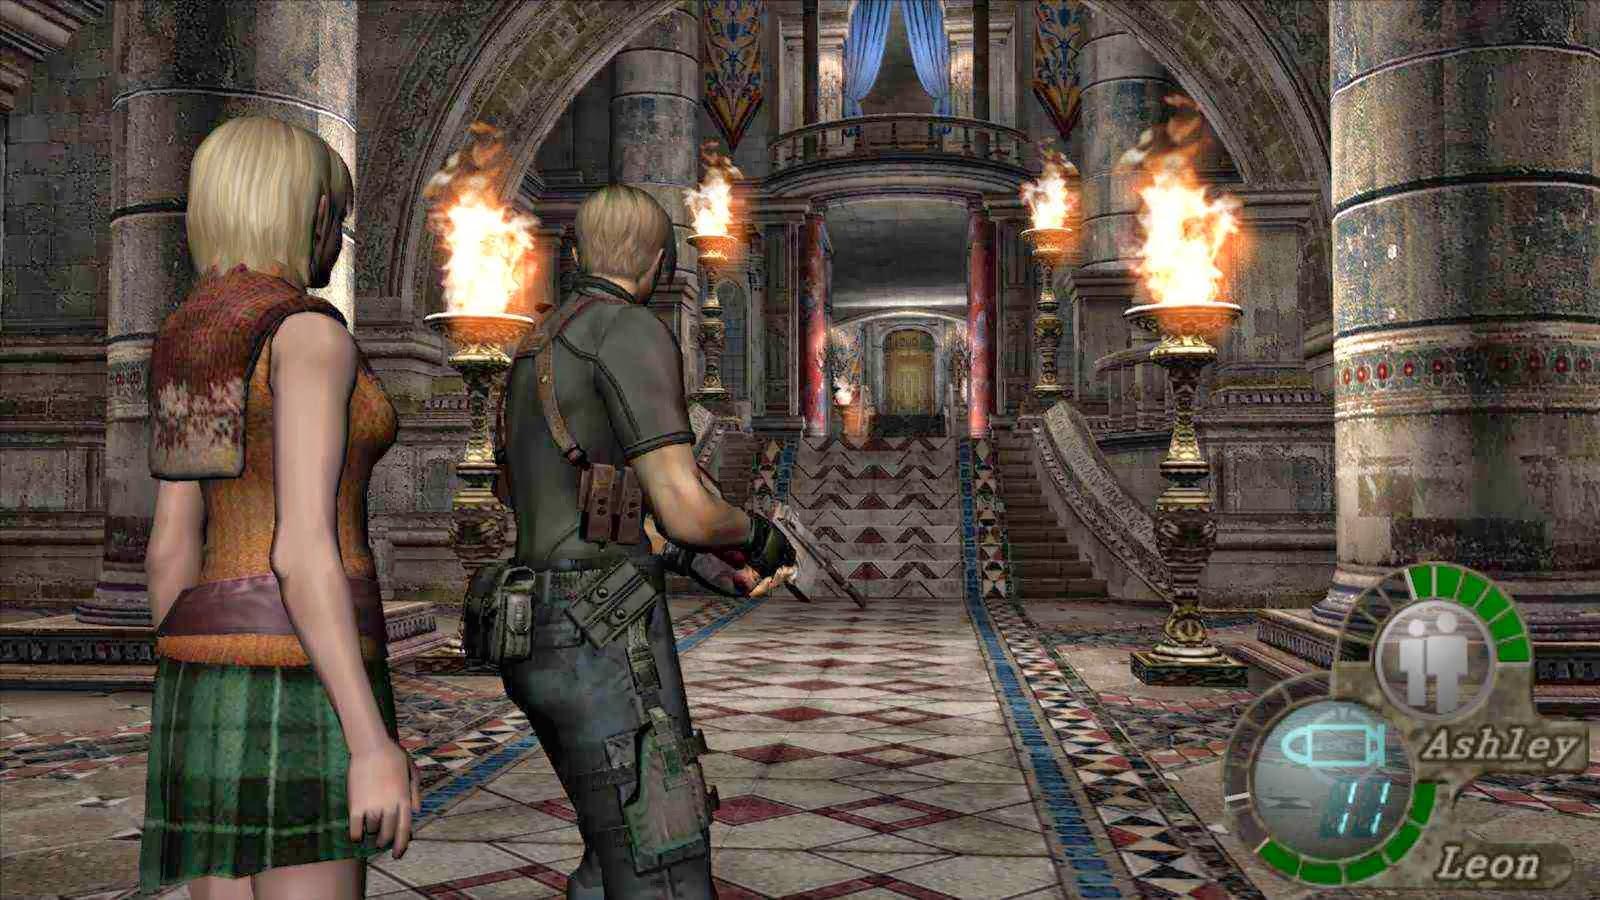 Download Game Residen Evil 4 Pc D0wnloadrhino S Blog